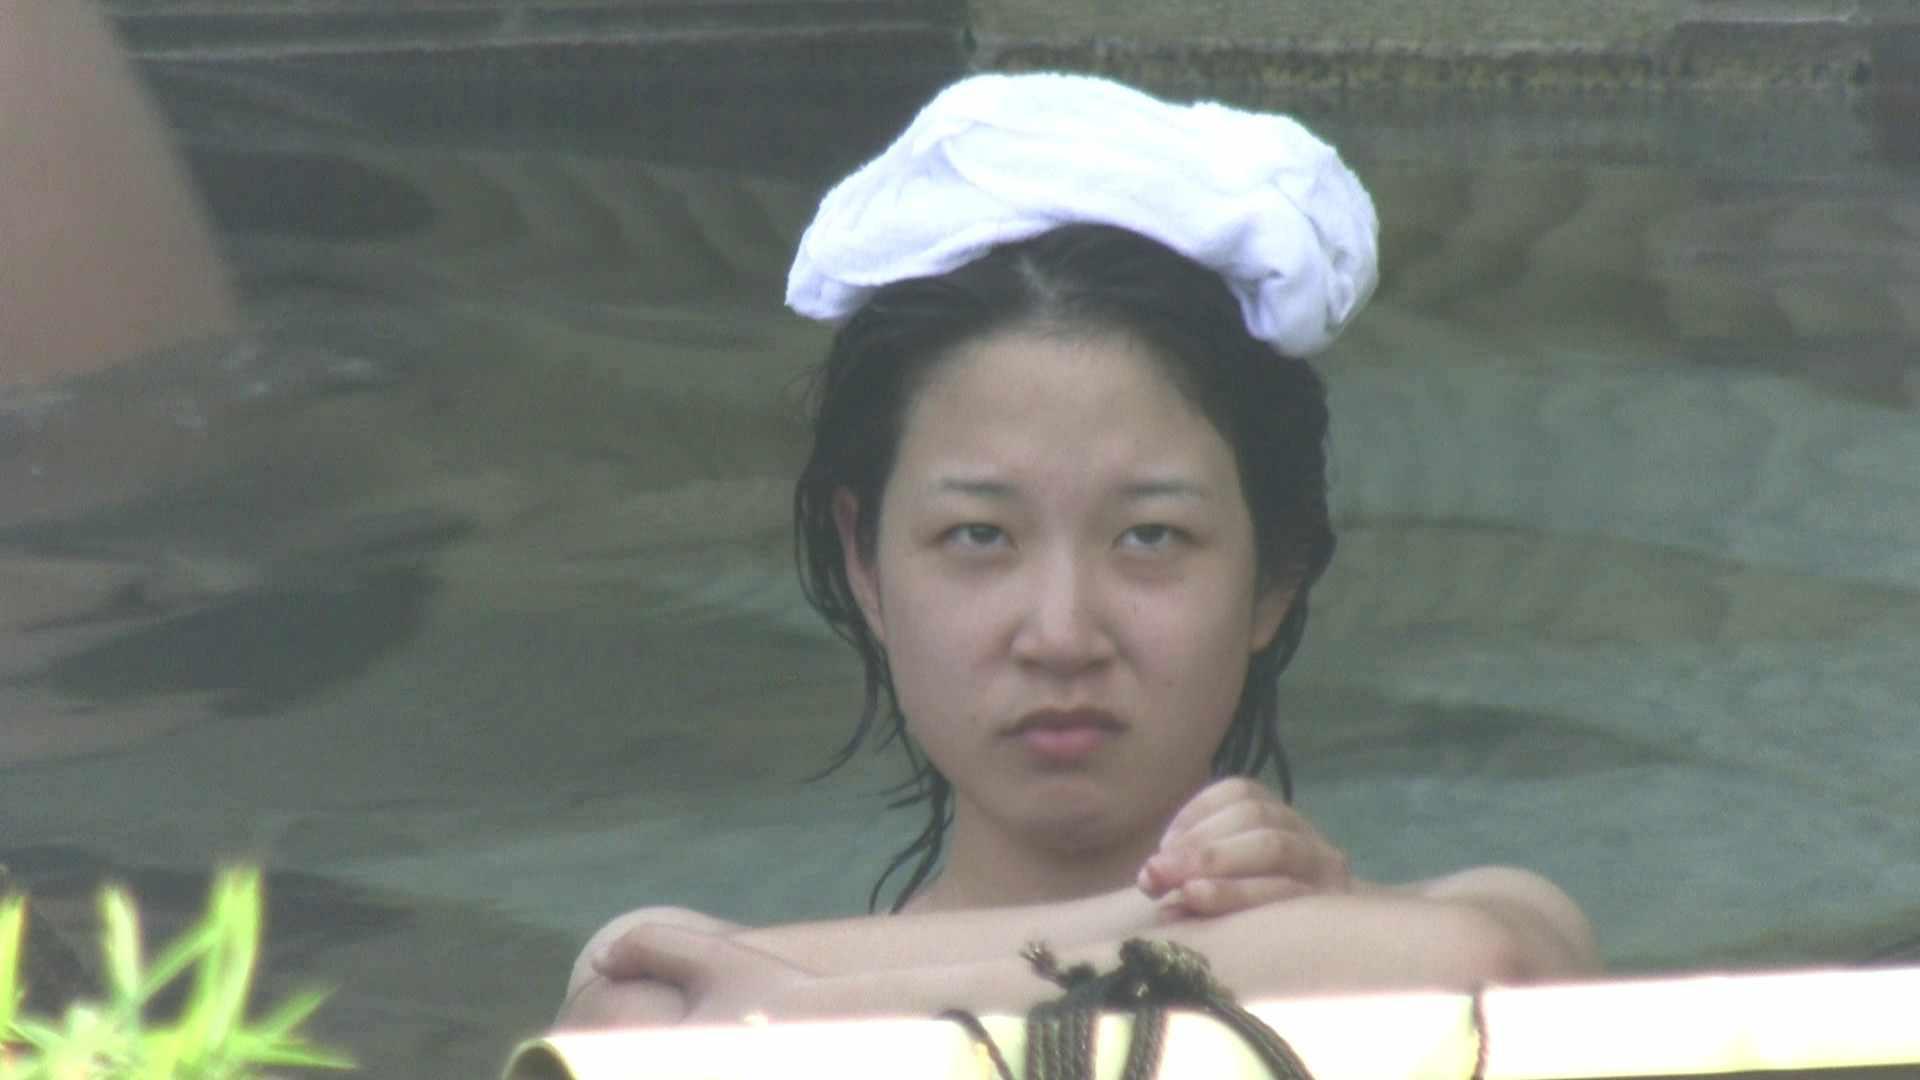 Aquaな露天風呂Vol.172 盗撮   HなOL  55pic 38